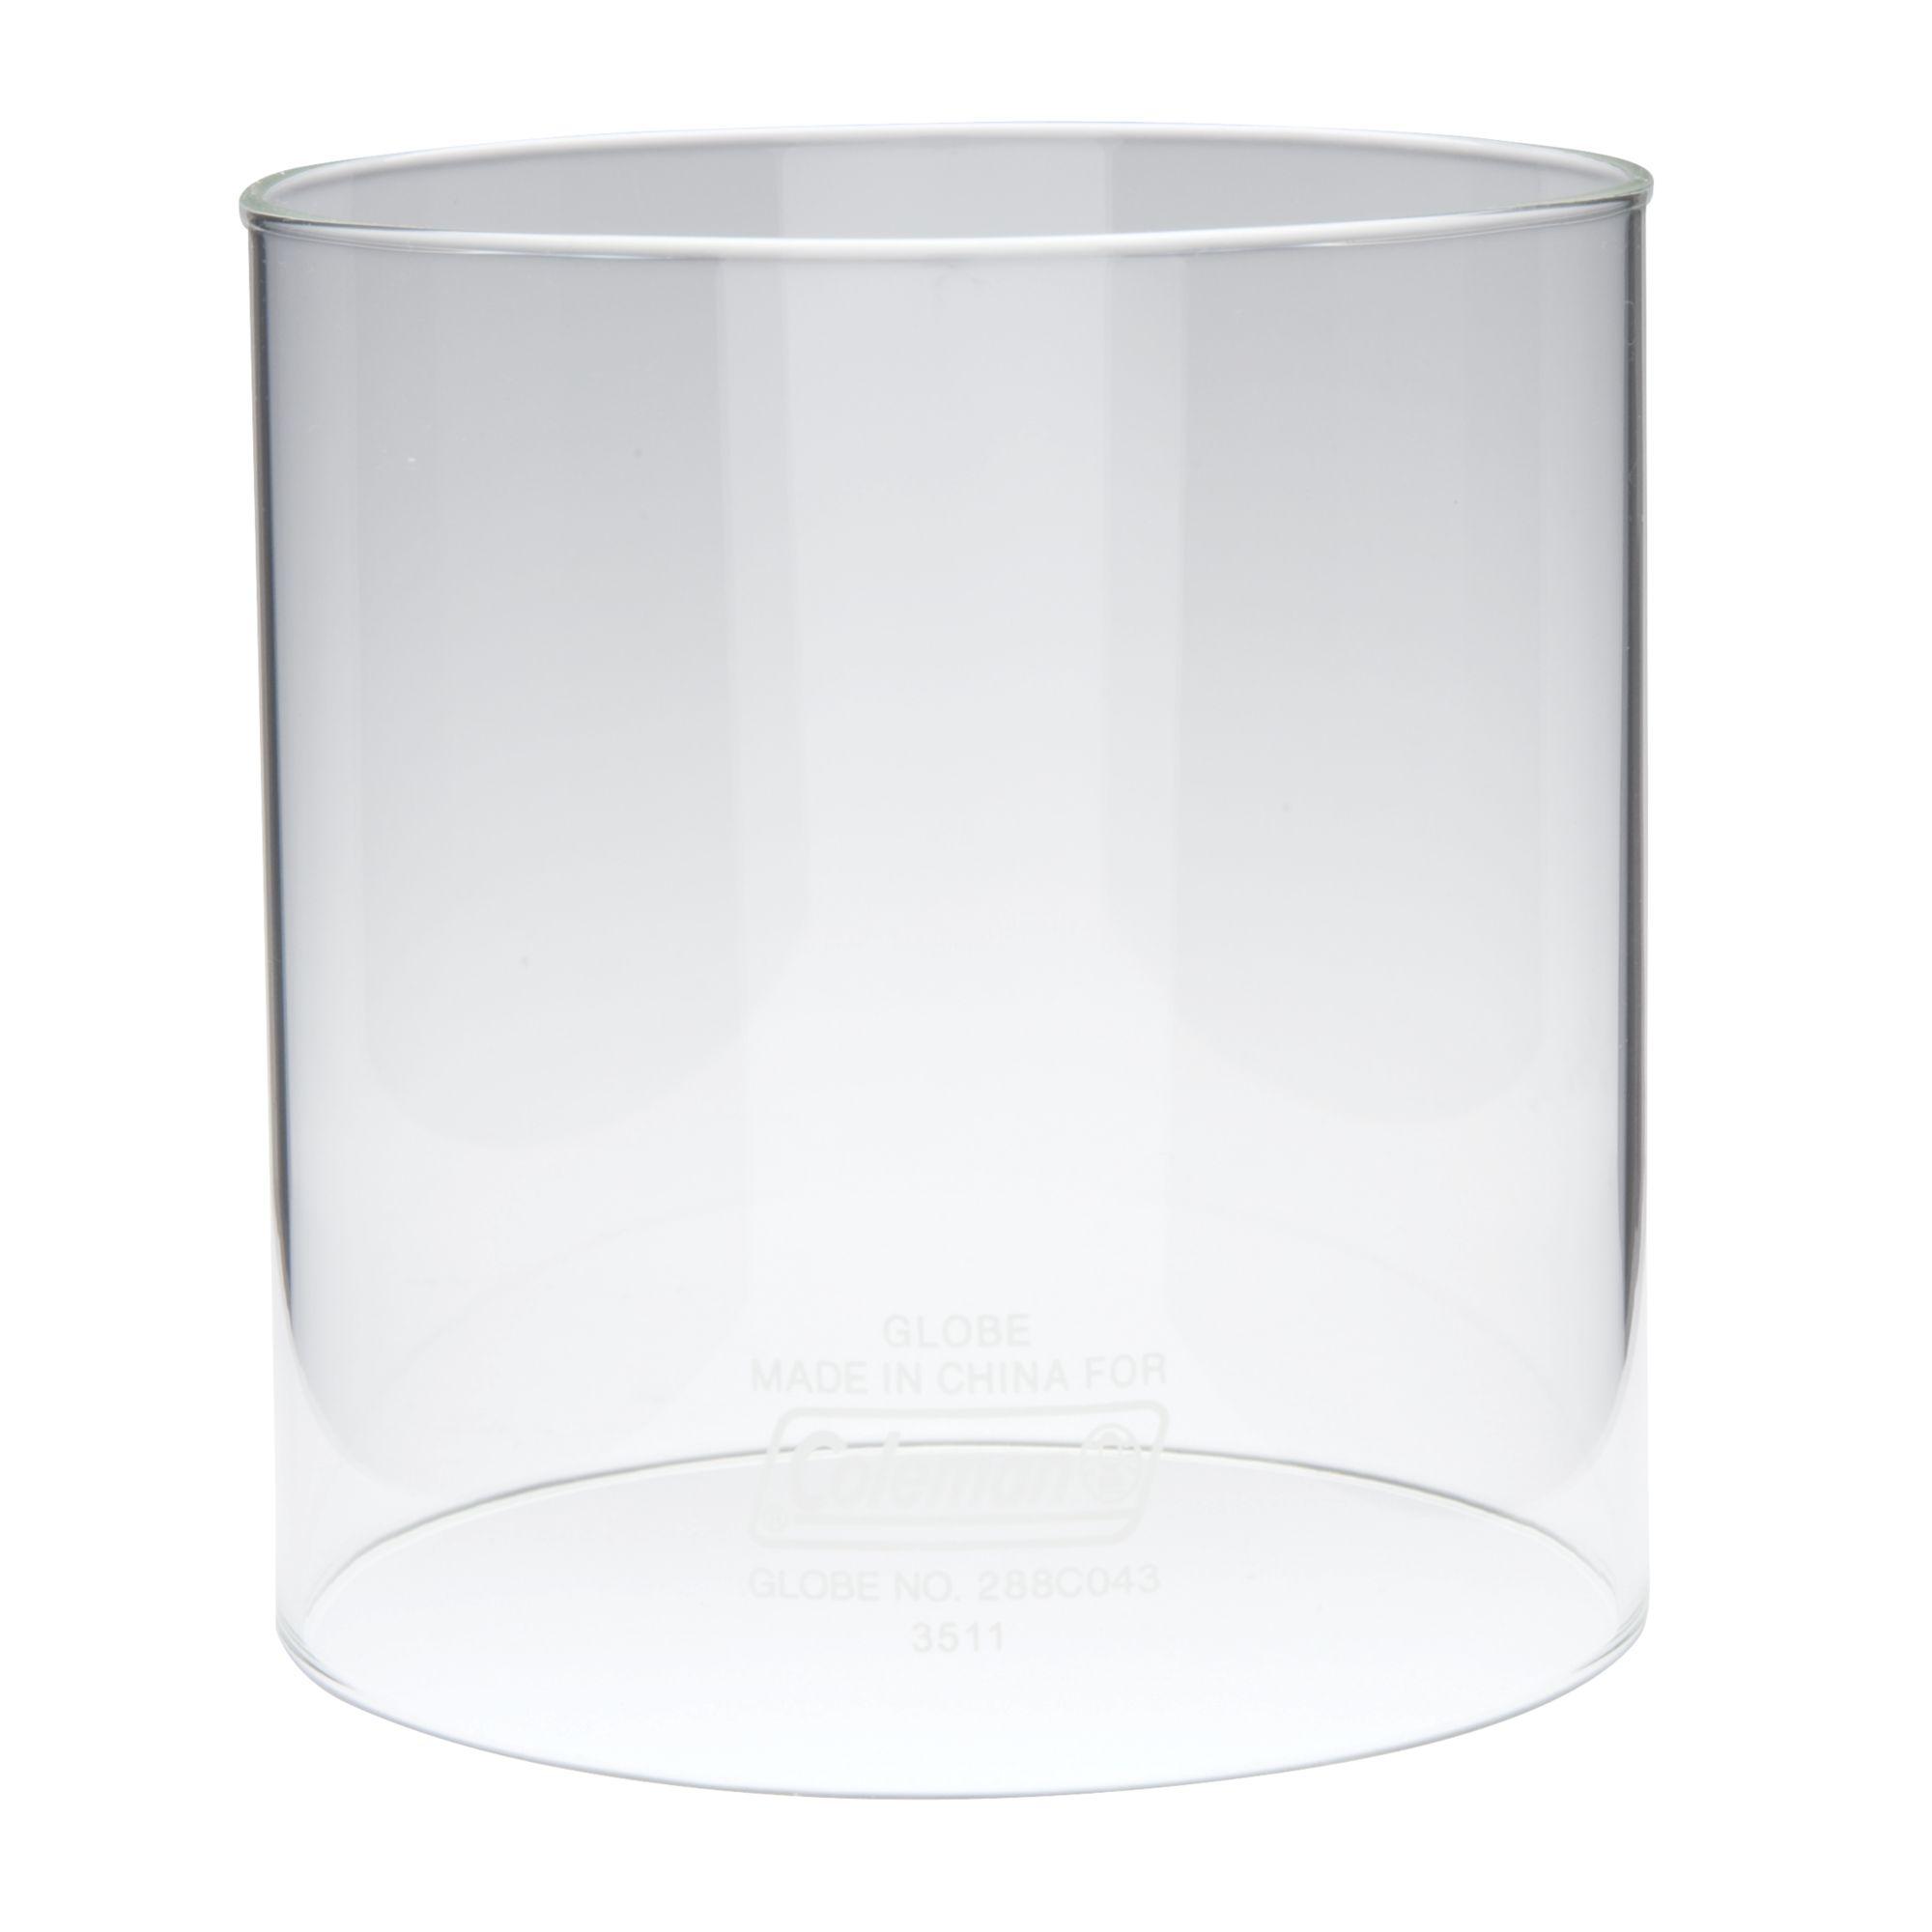 4 Standard Globe | Coleman